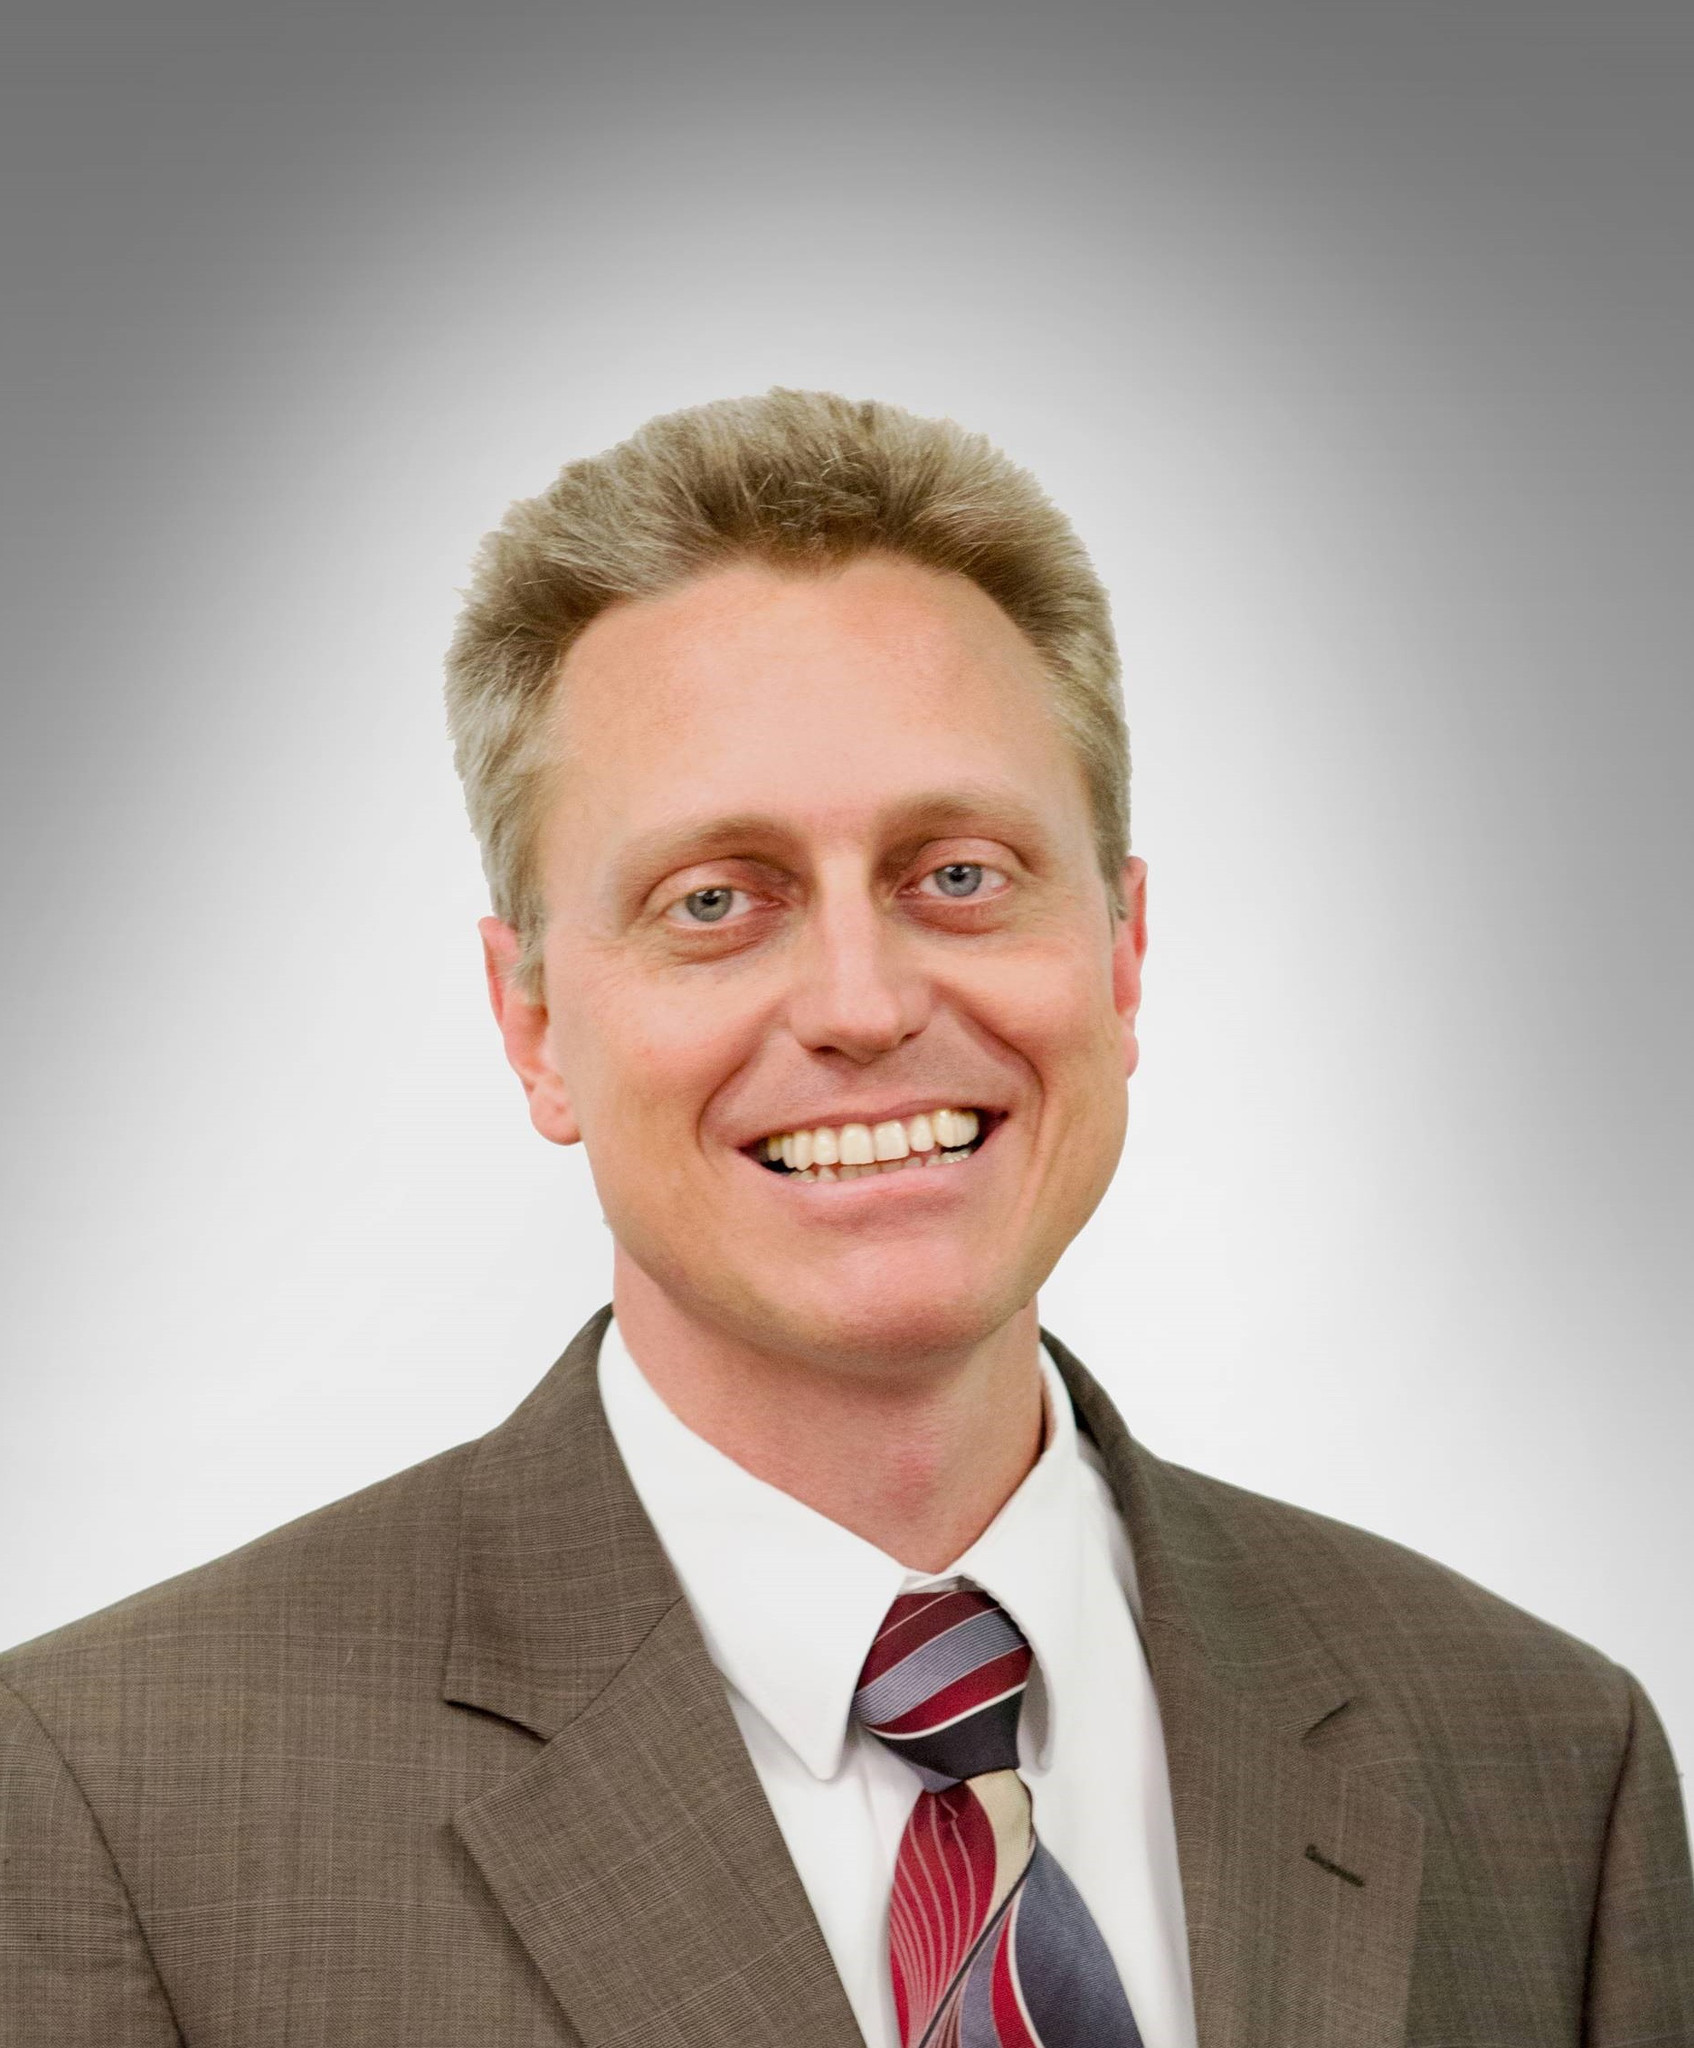 Who is Dr John Bergsma?